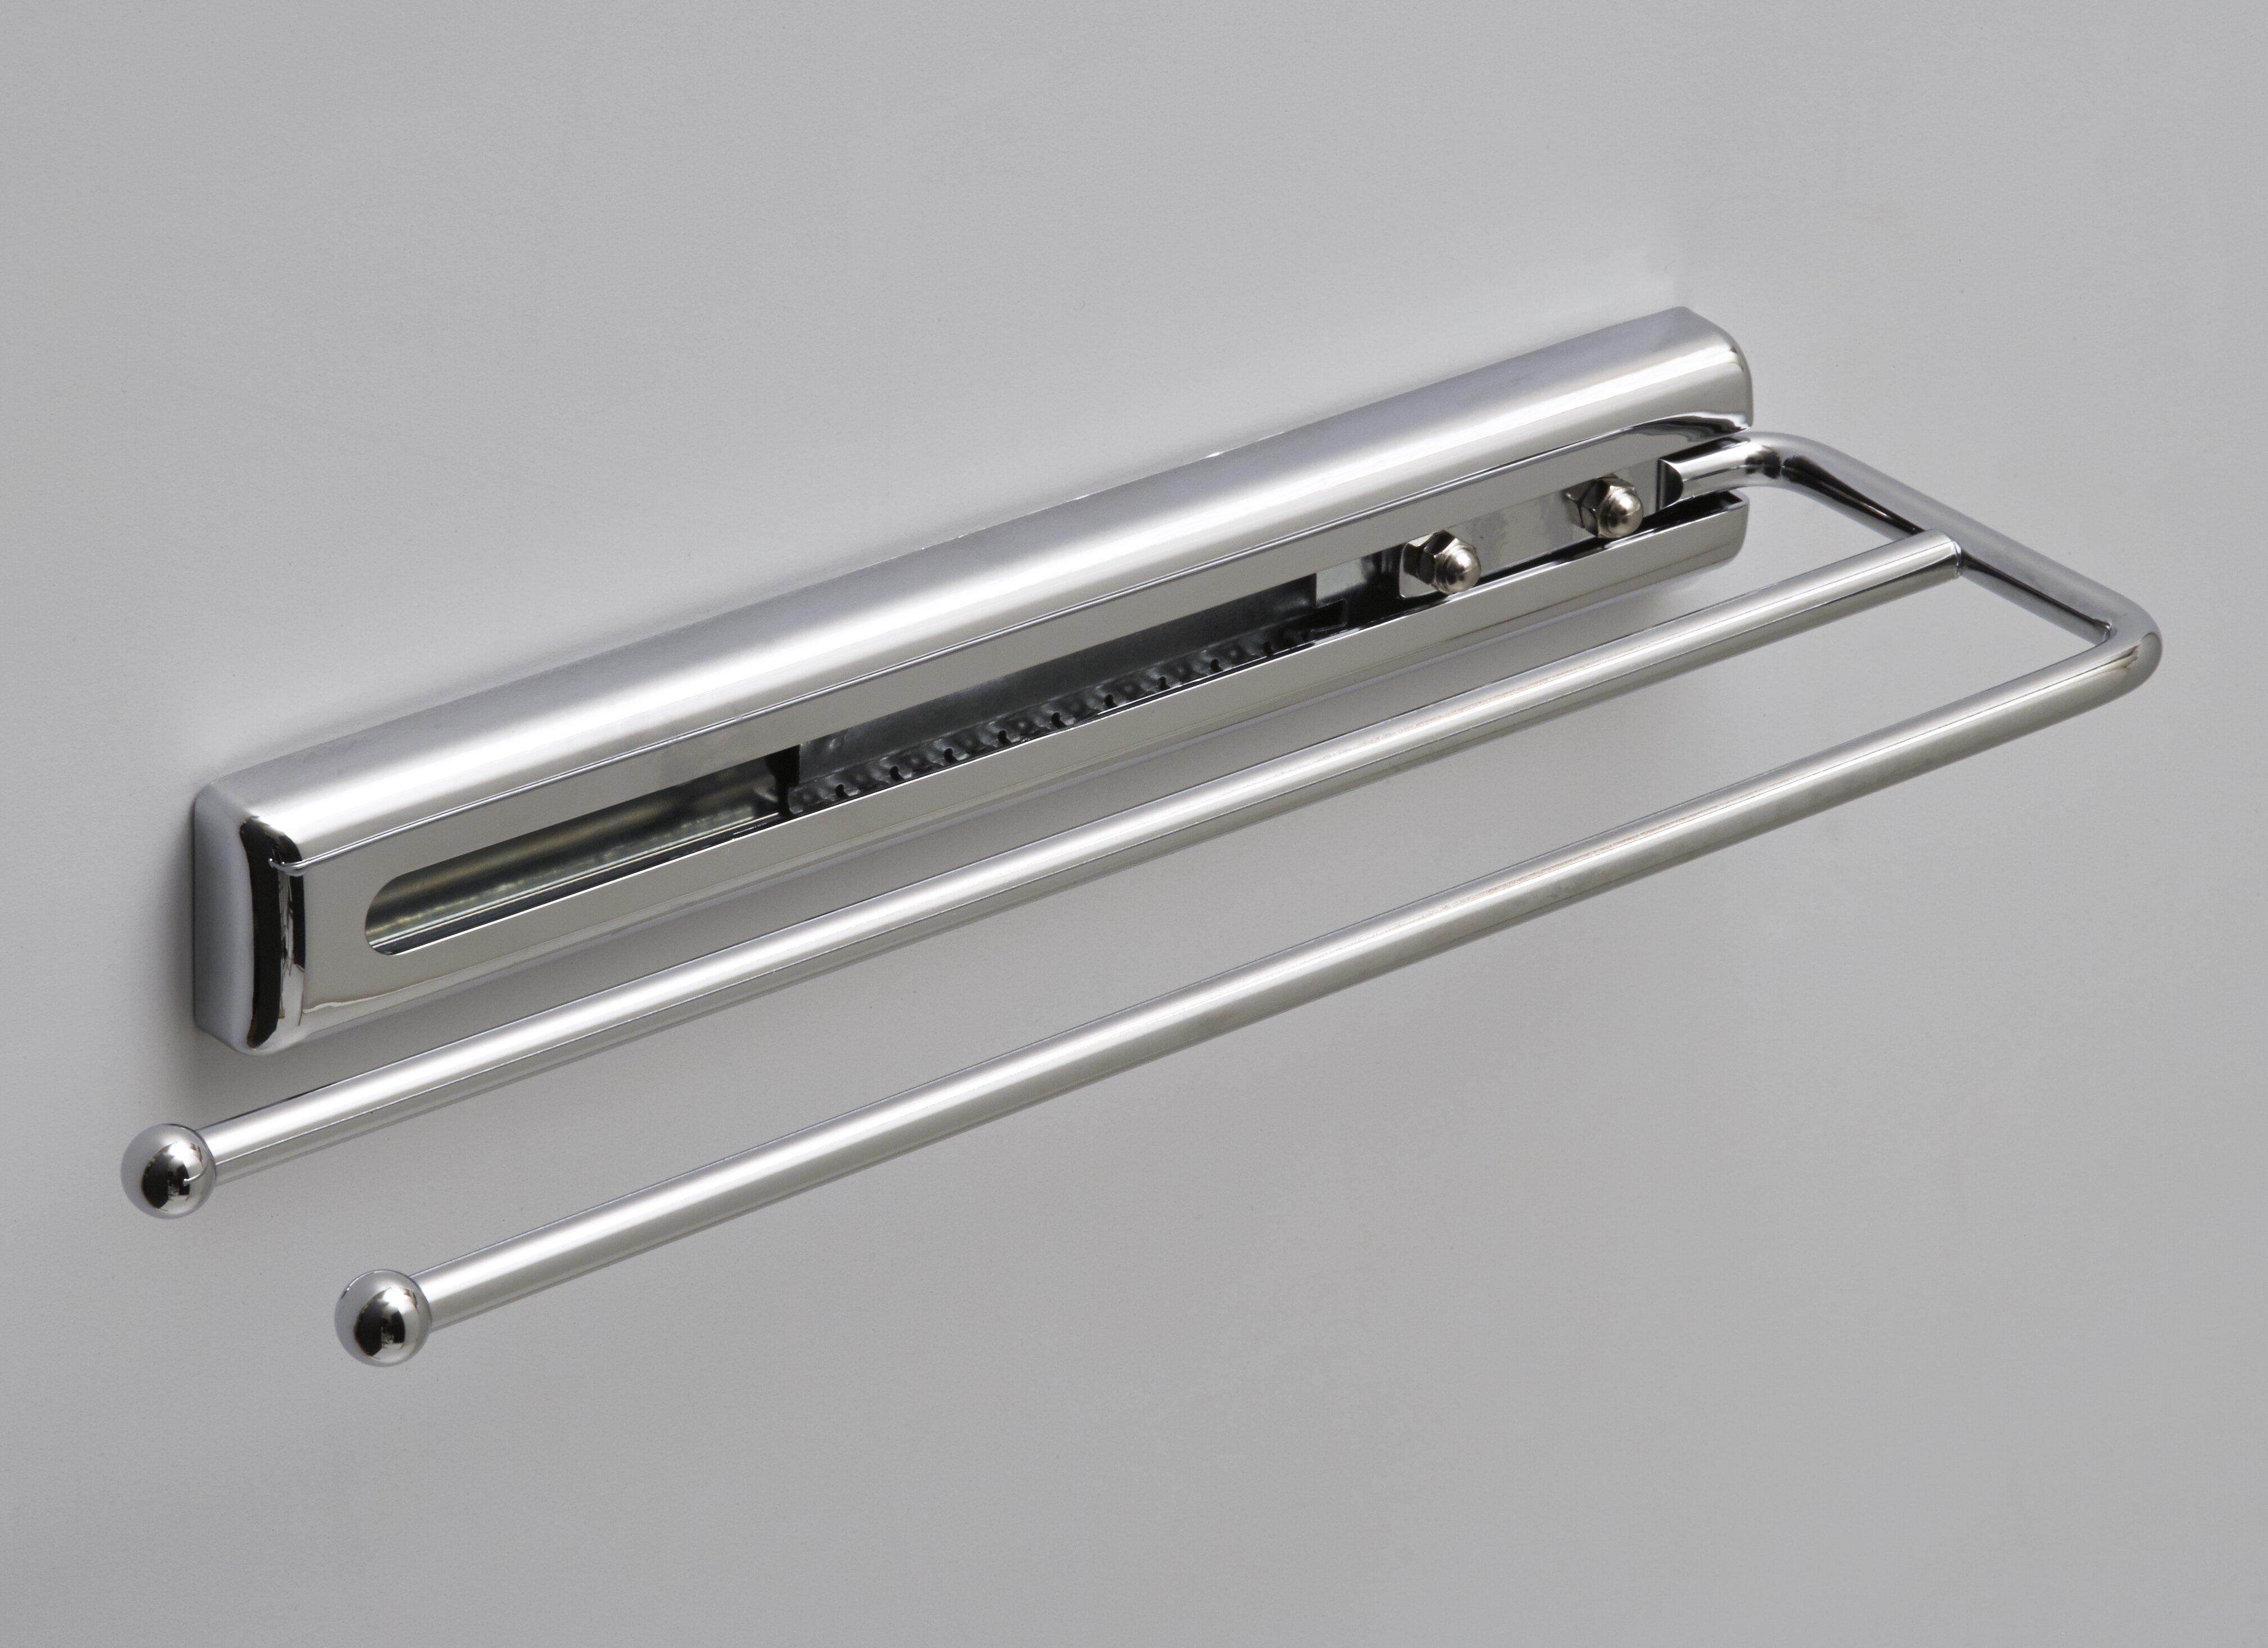 32 5cm Fixture Mounted Towel Rail